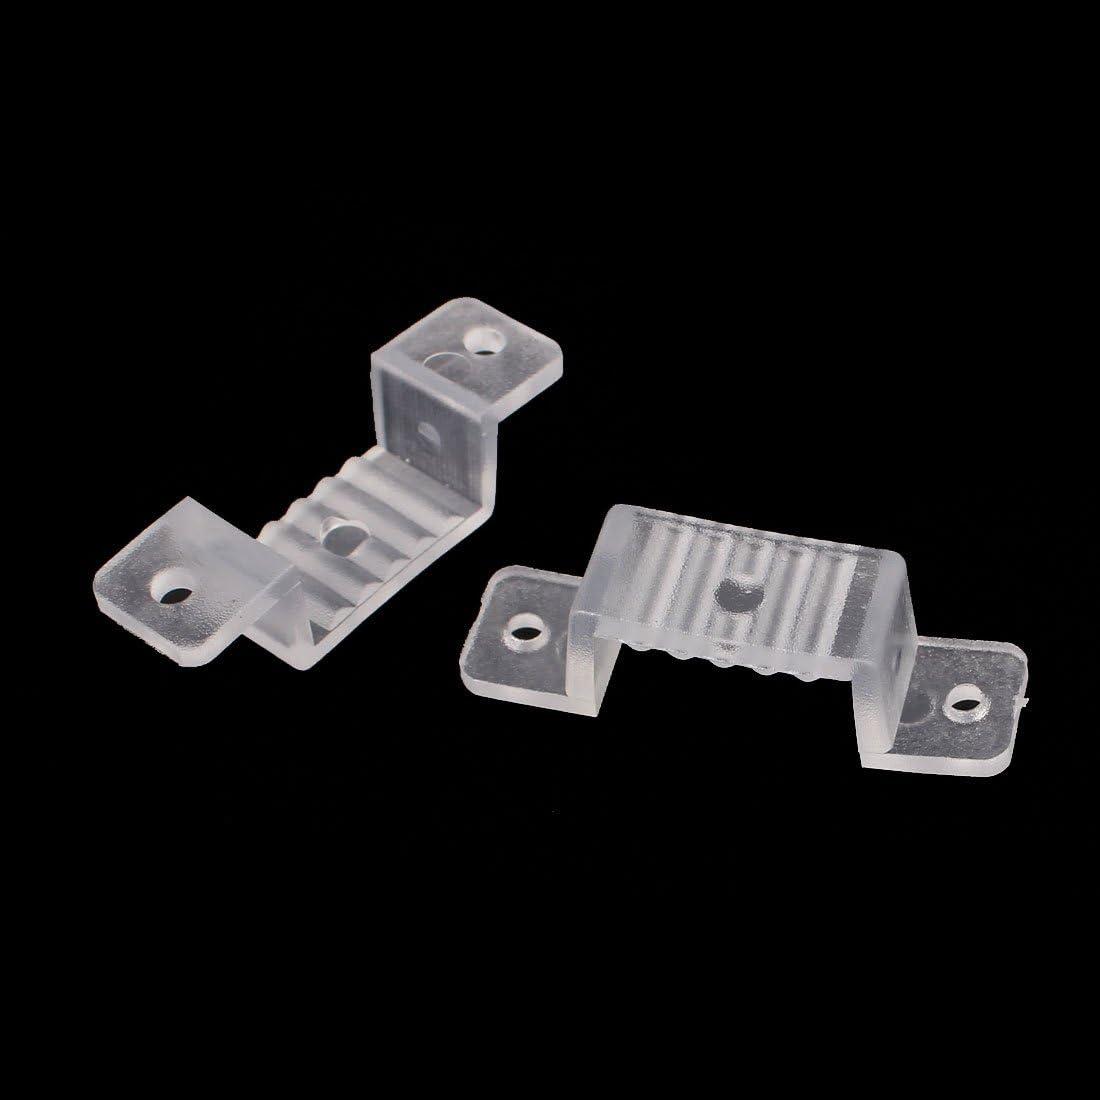 uxcell 18mm x 8mm Plastic LED Light Strip Fixing Mounting Bracket Clear 100pcs US-SA-AJD-359615